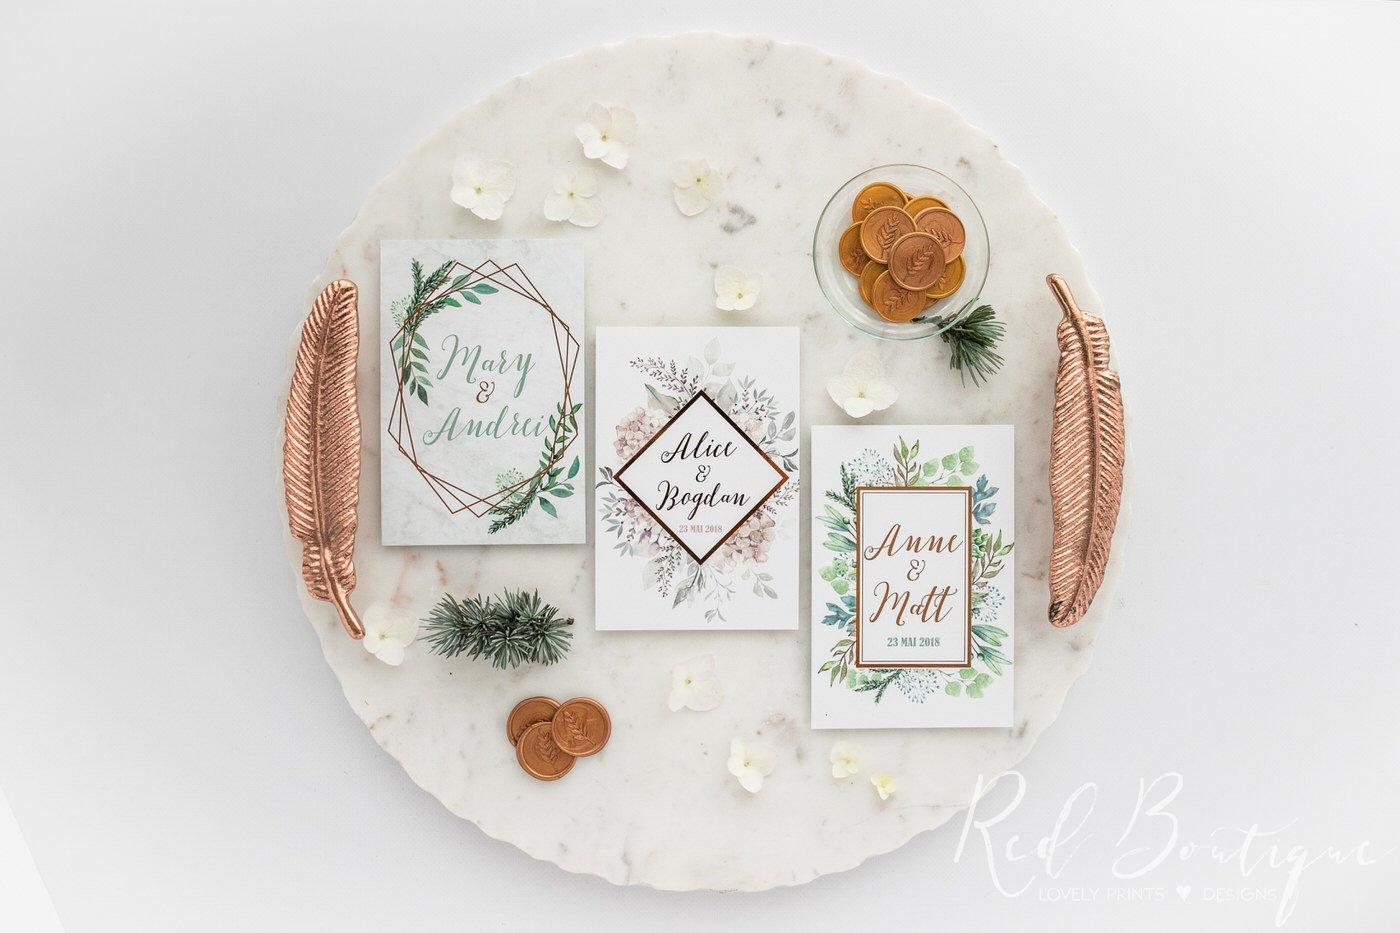 invitatii moderne cu scris rose gold si carton catifelat deosebit